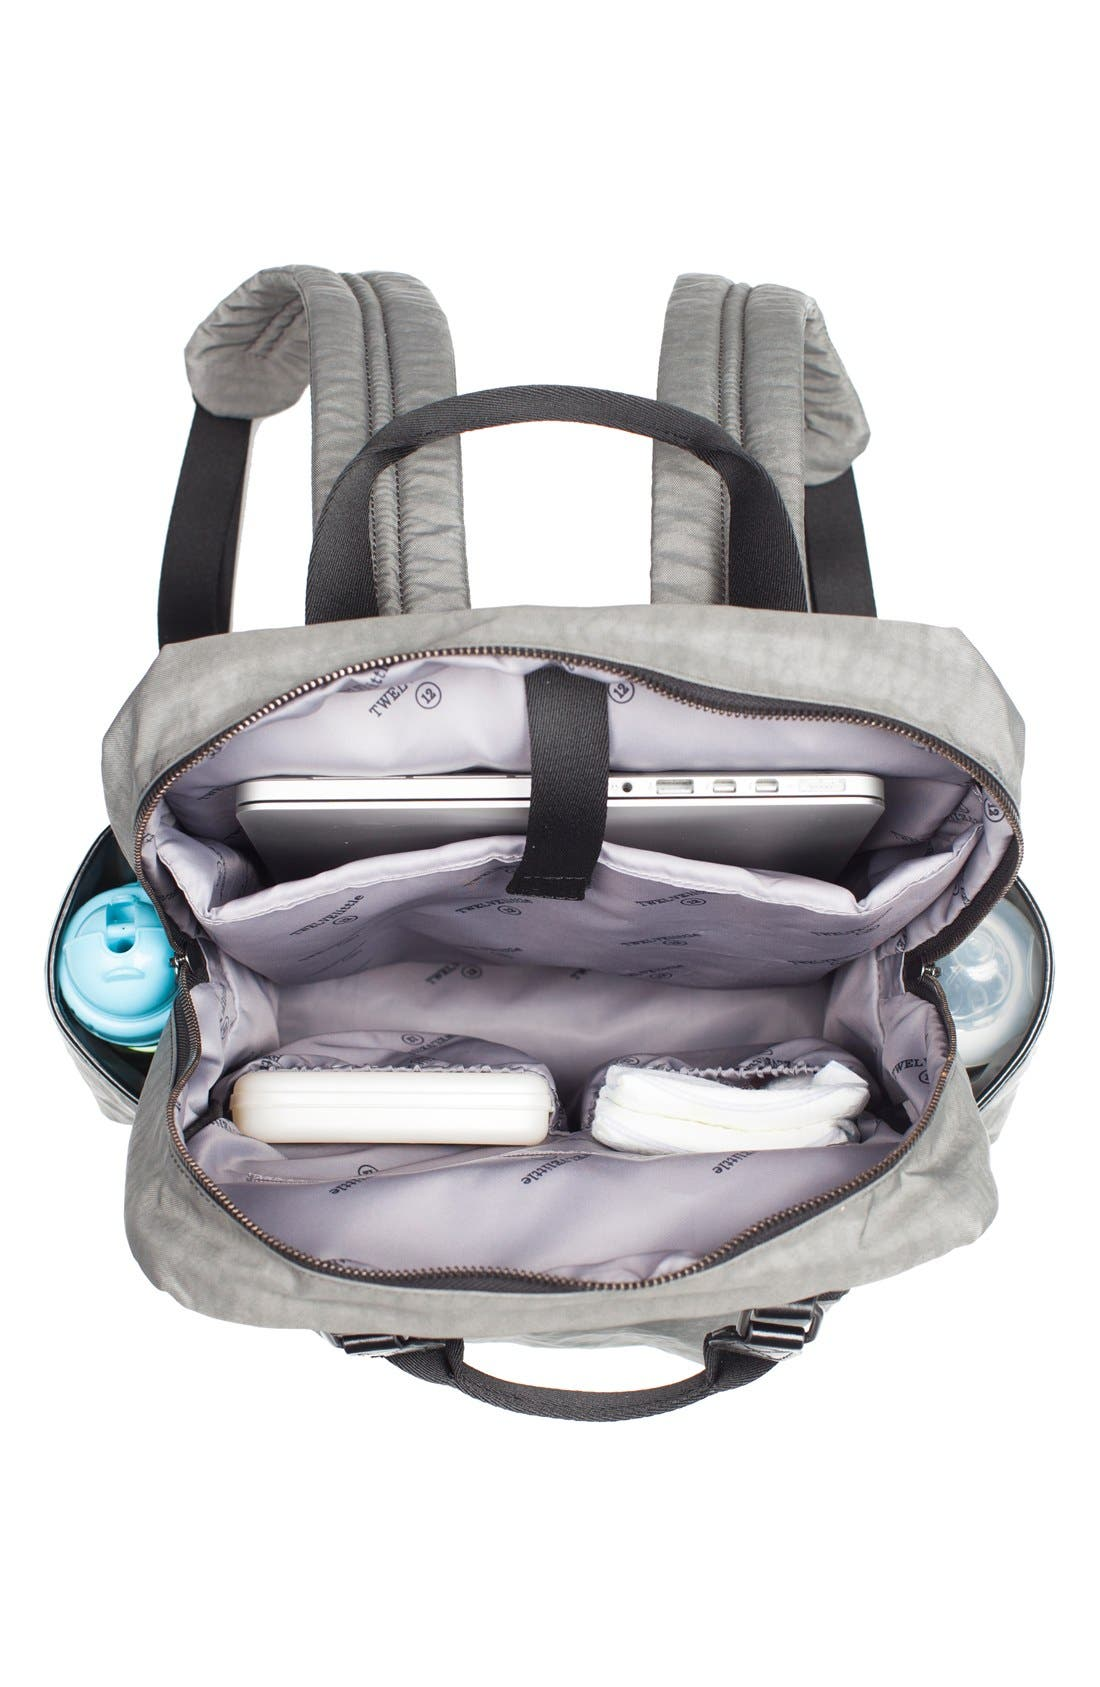 'Courage' Unisex Backpack Diaper Bag,                             Alternate thumbnail 7, color,                             DARK GREY